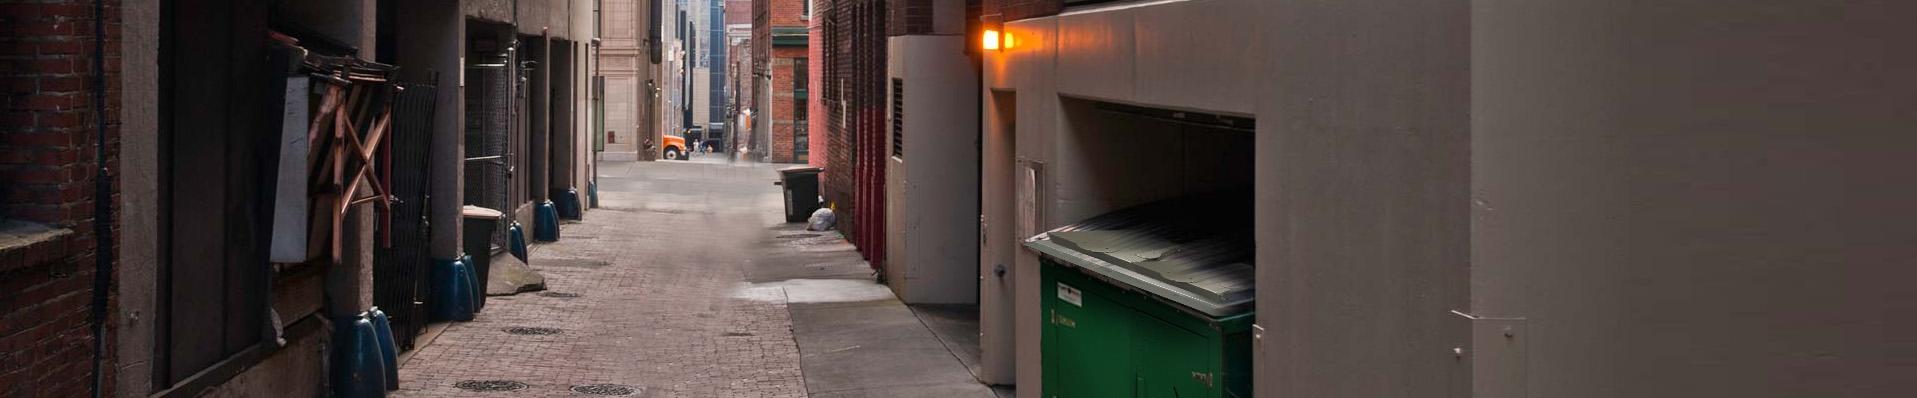 Commercial Garbage Bin